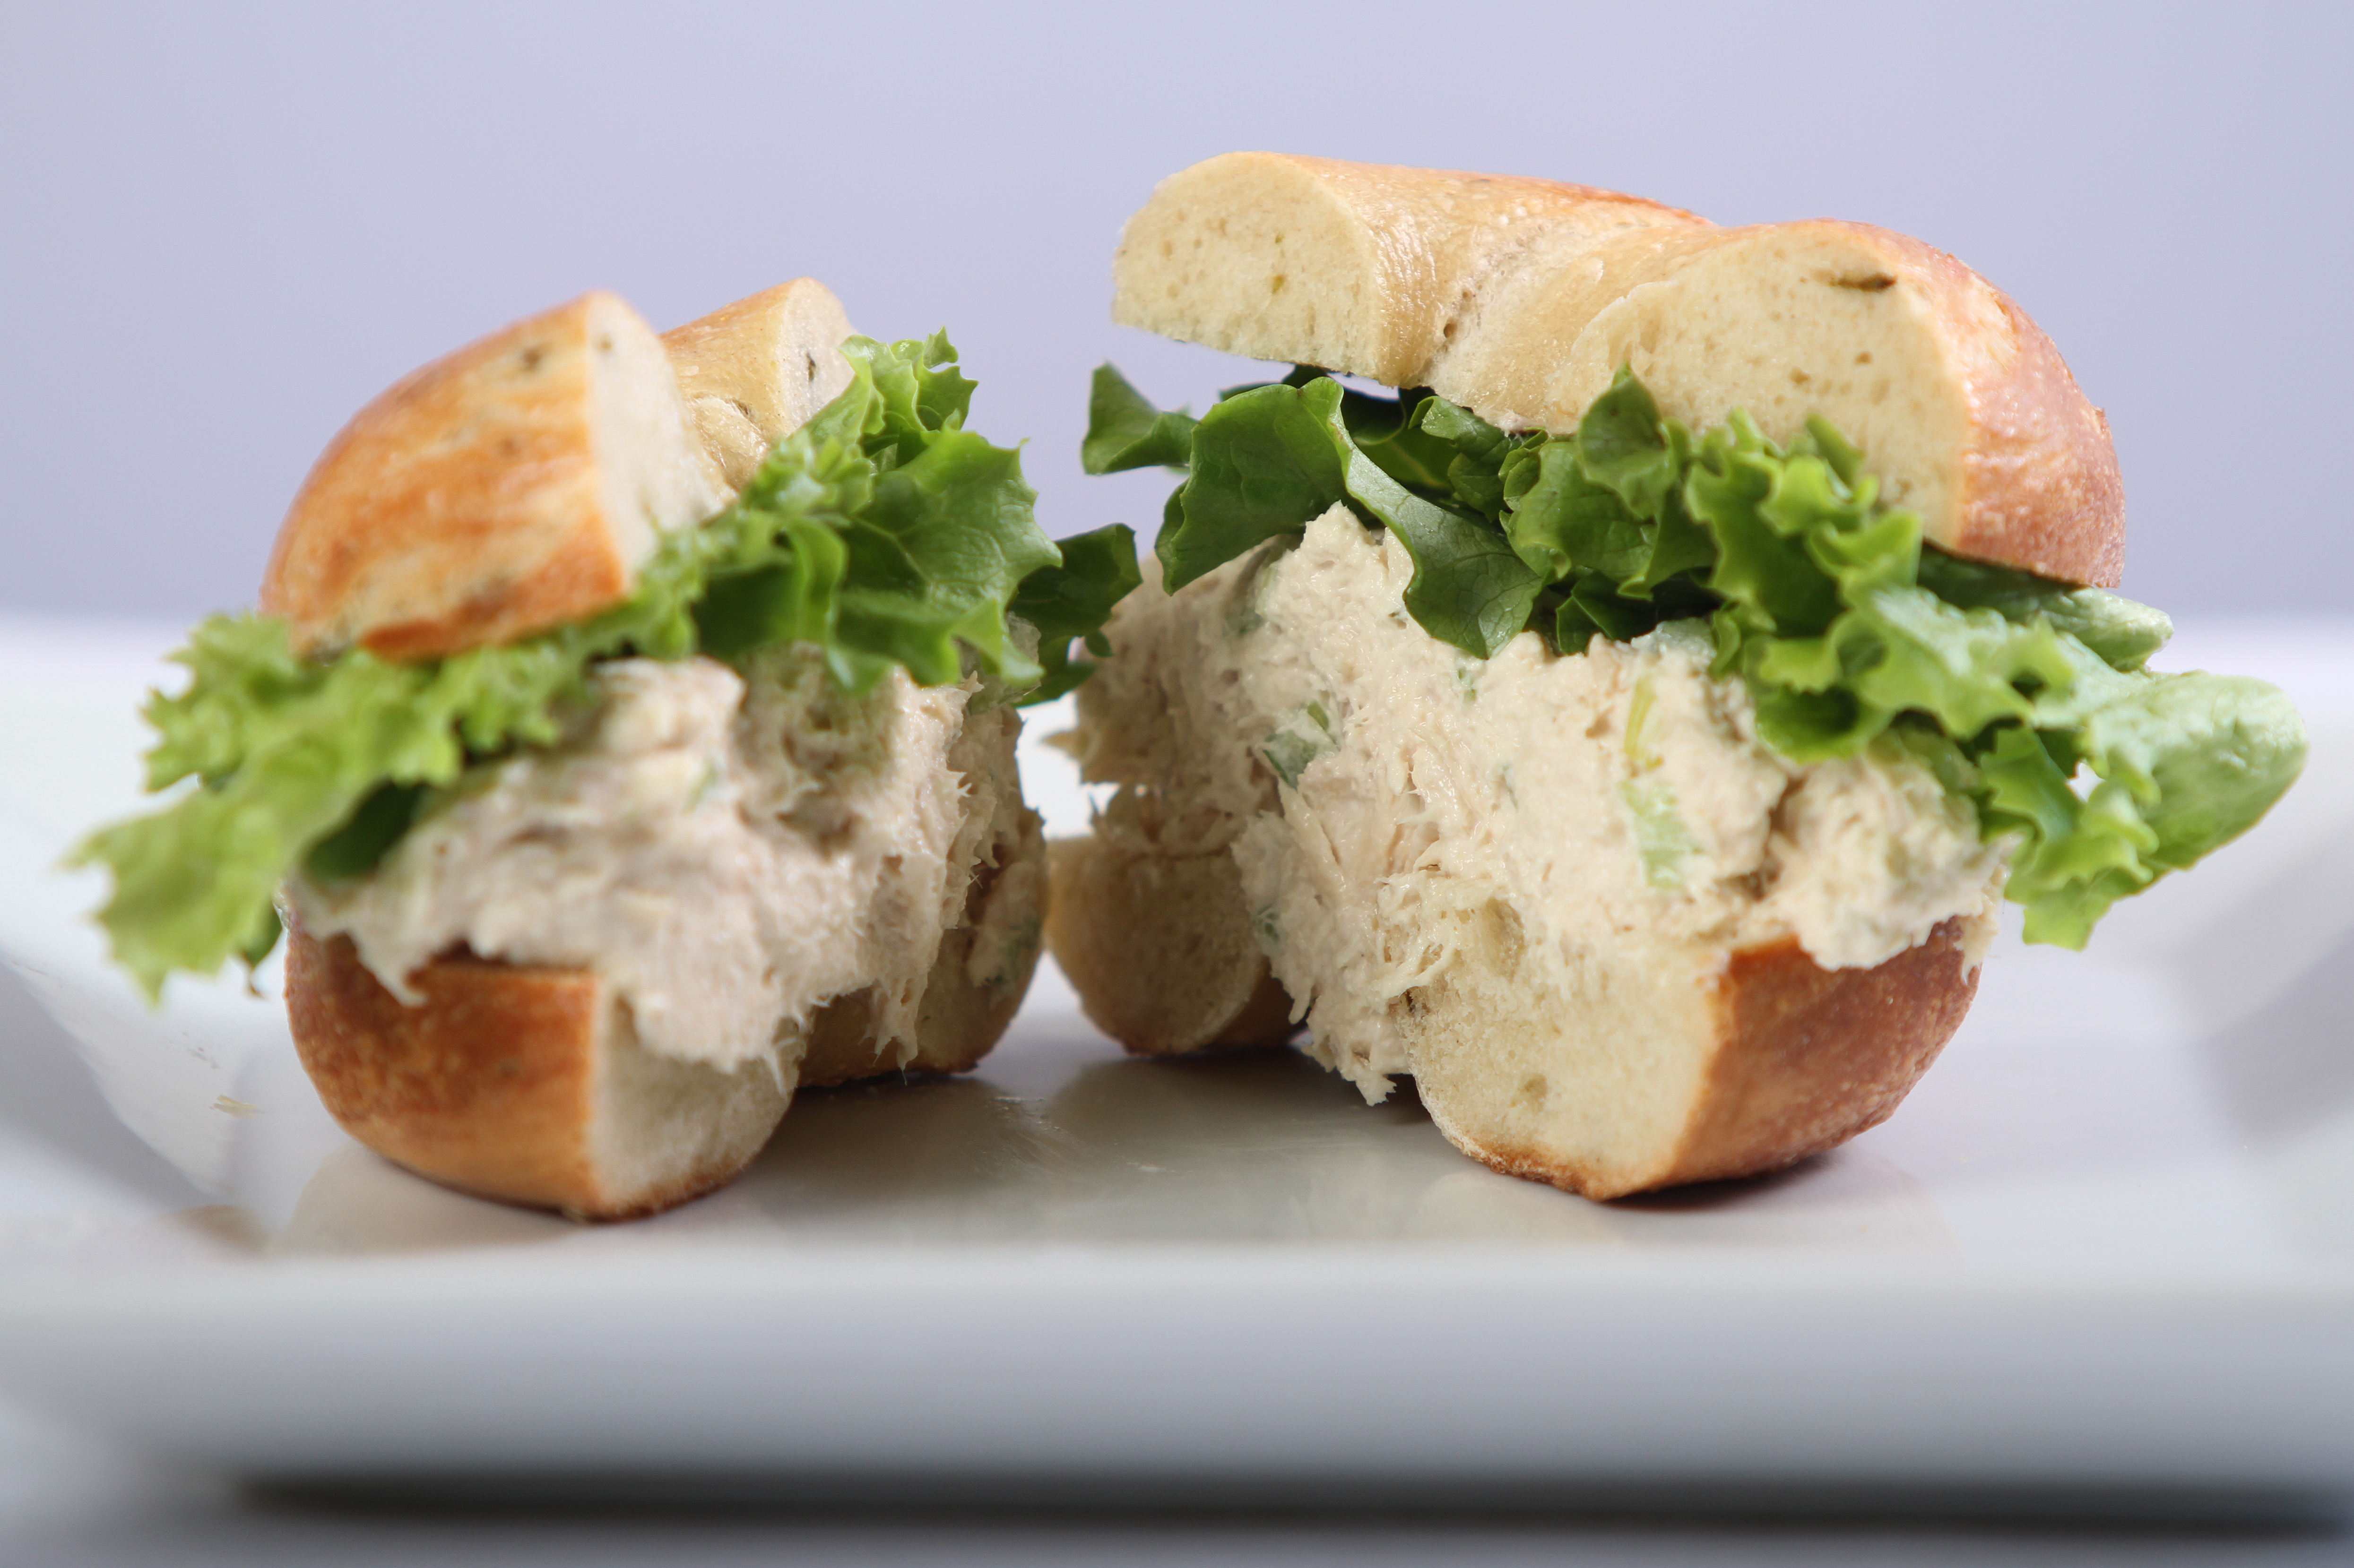 Tuna Sanwich on a Croissant